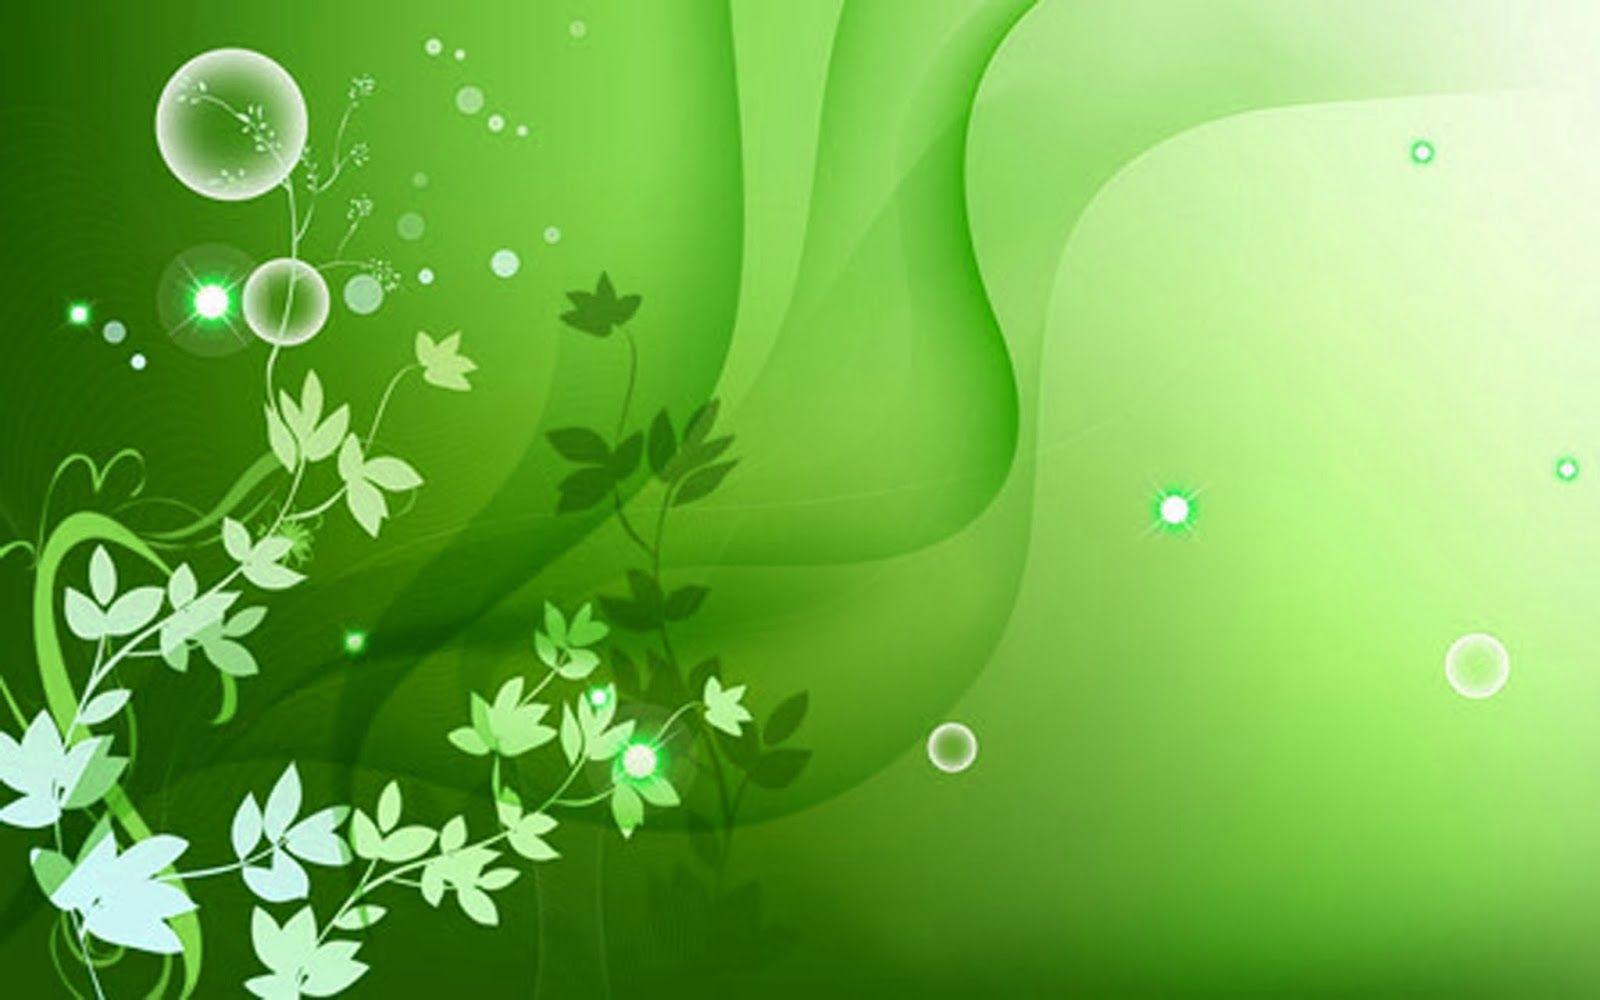 Color Wallpaper Green Flower